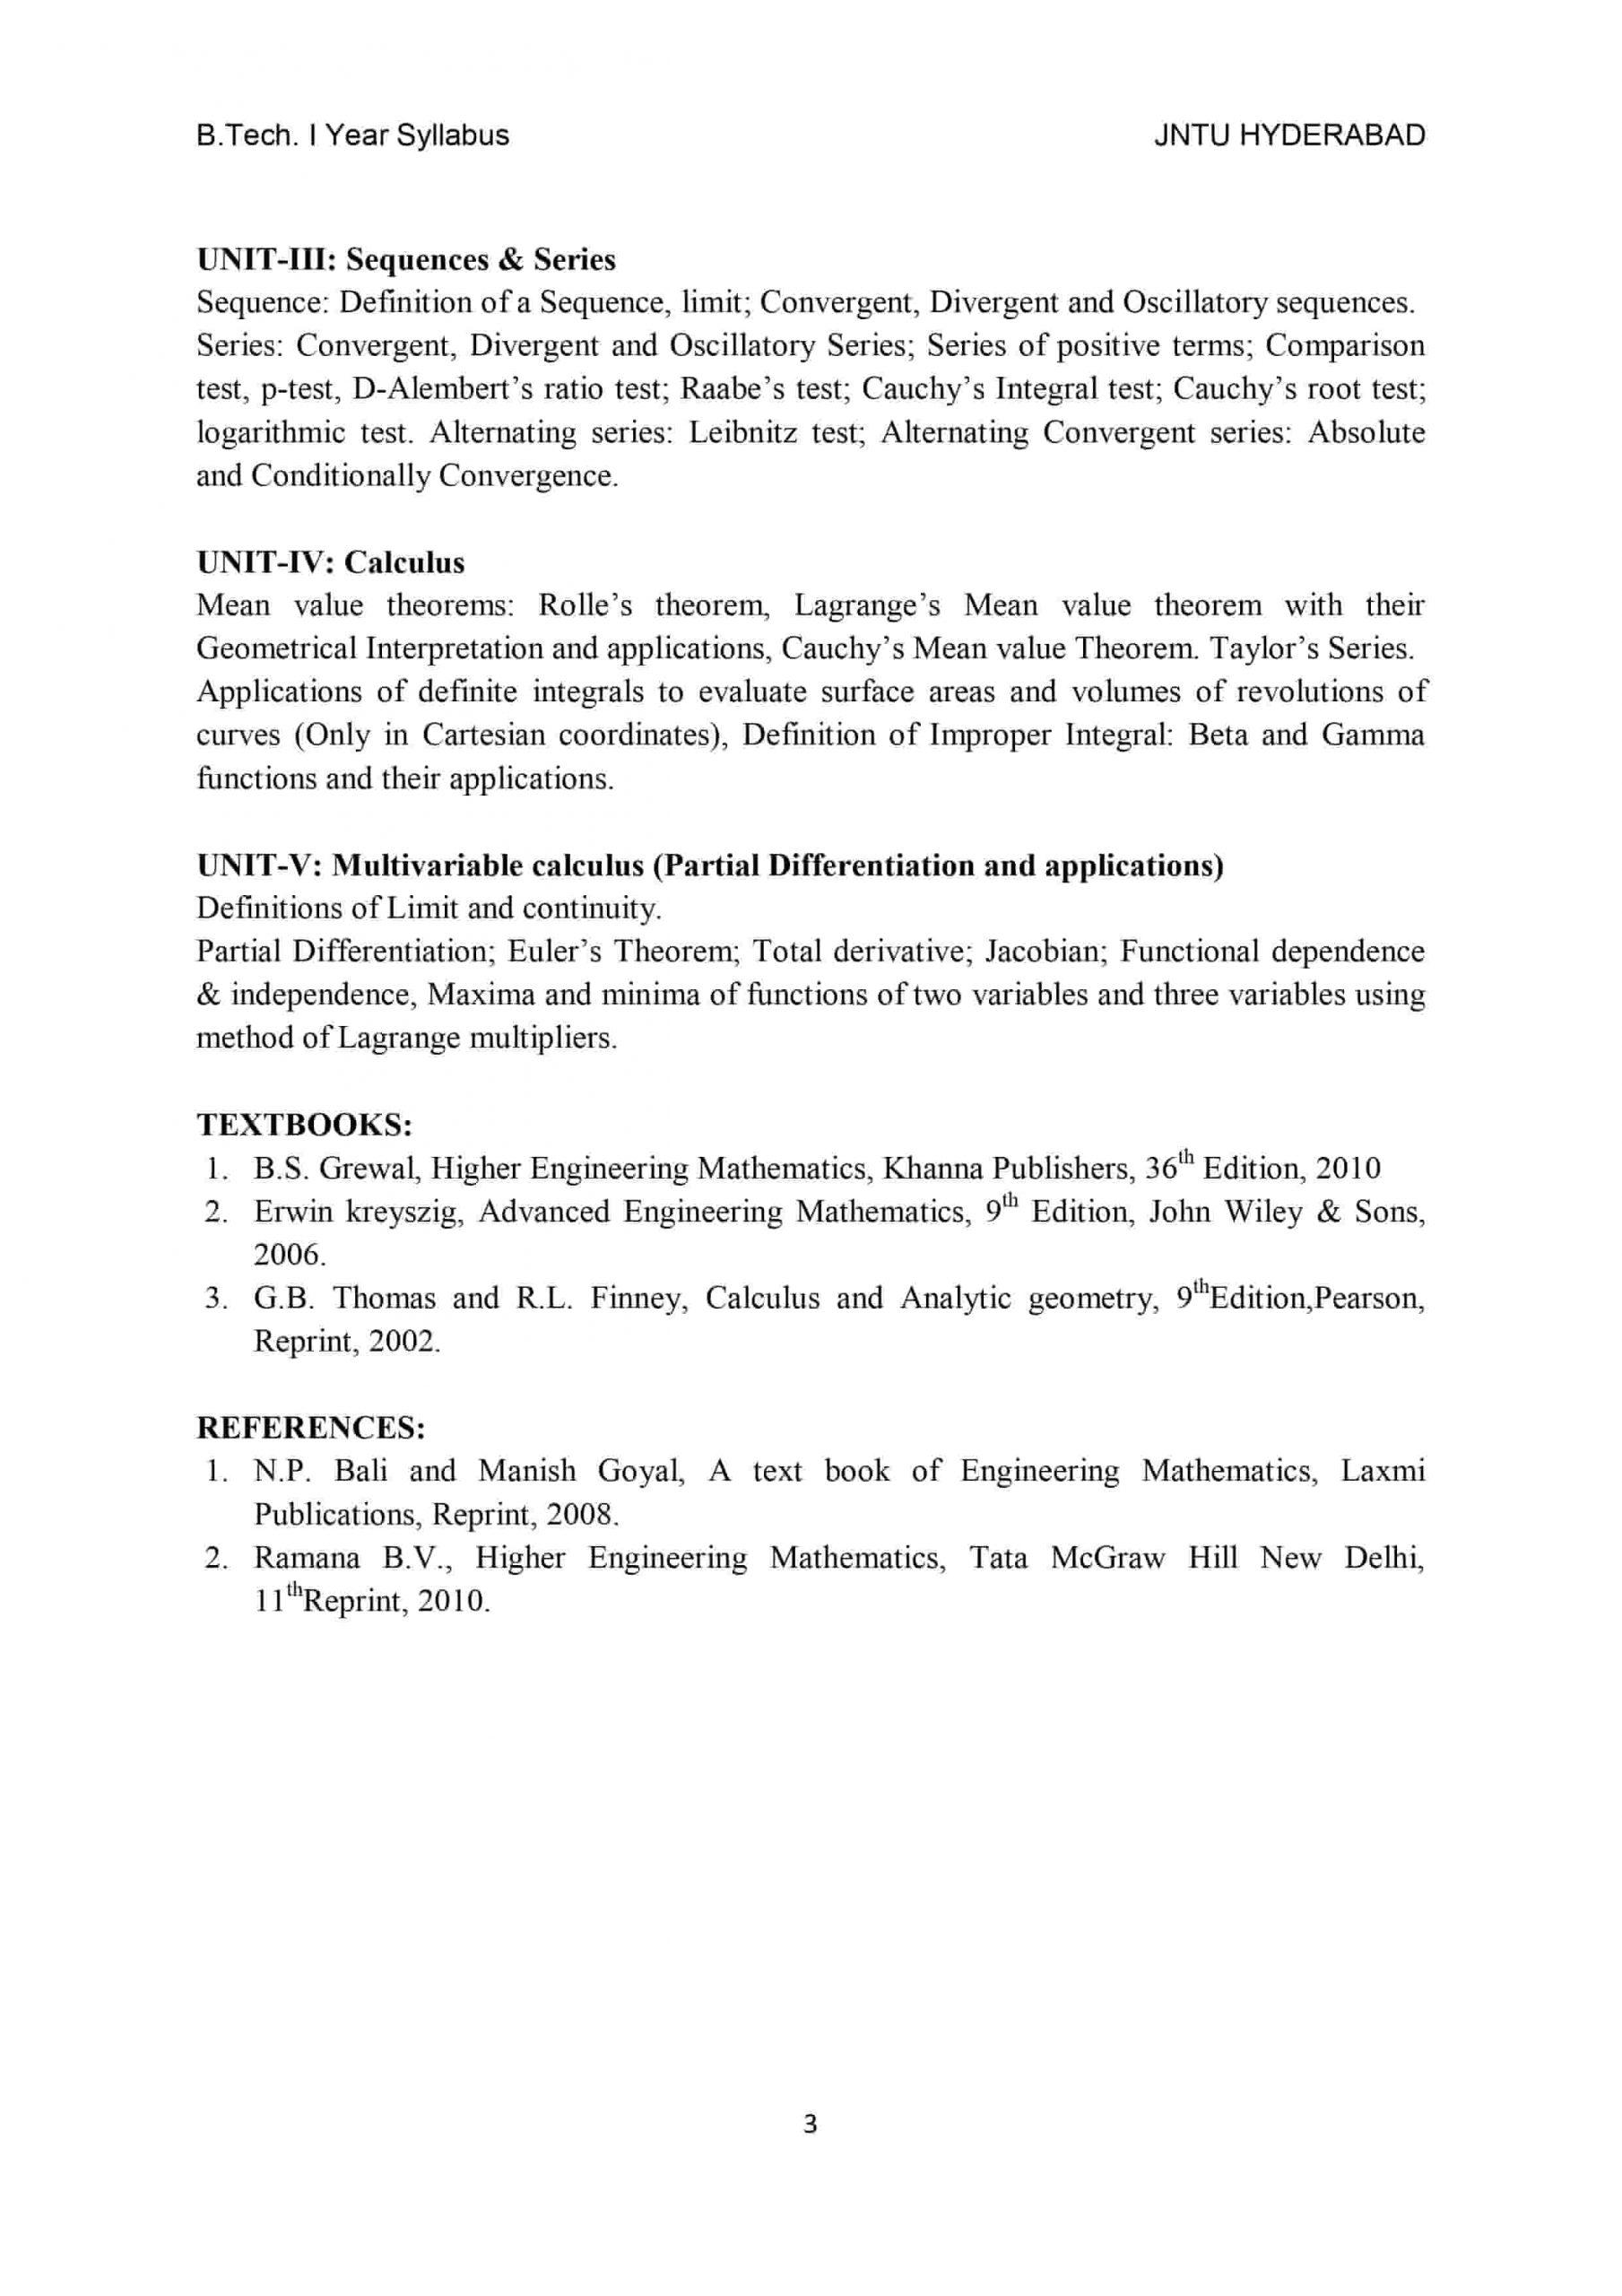 engineering mathematics m1 r18 syllabus